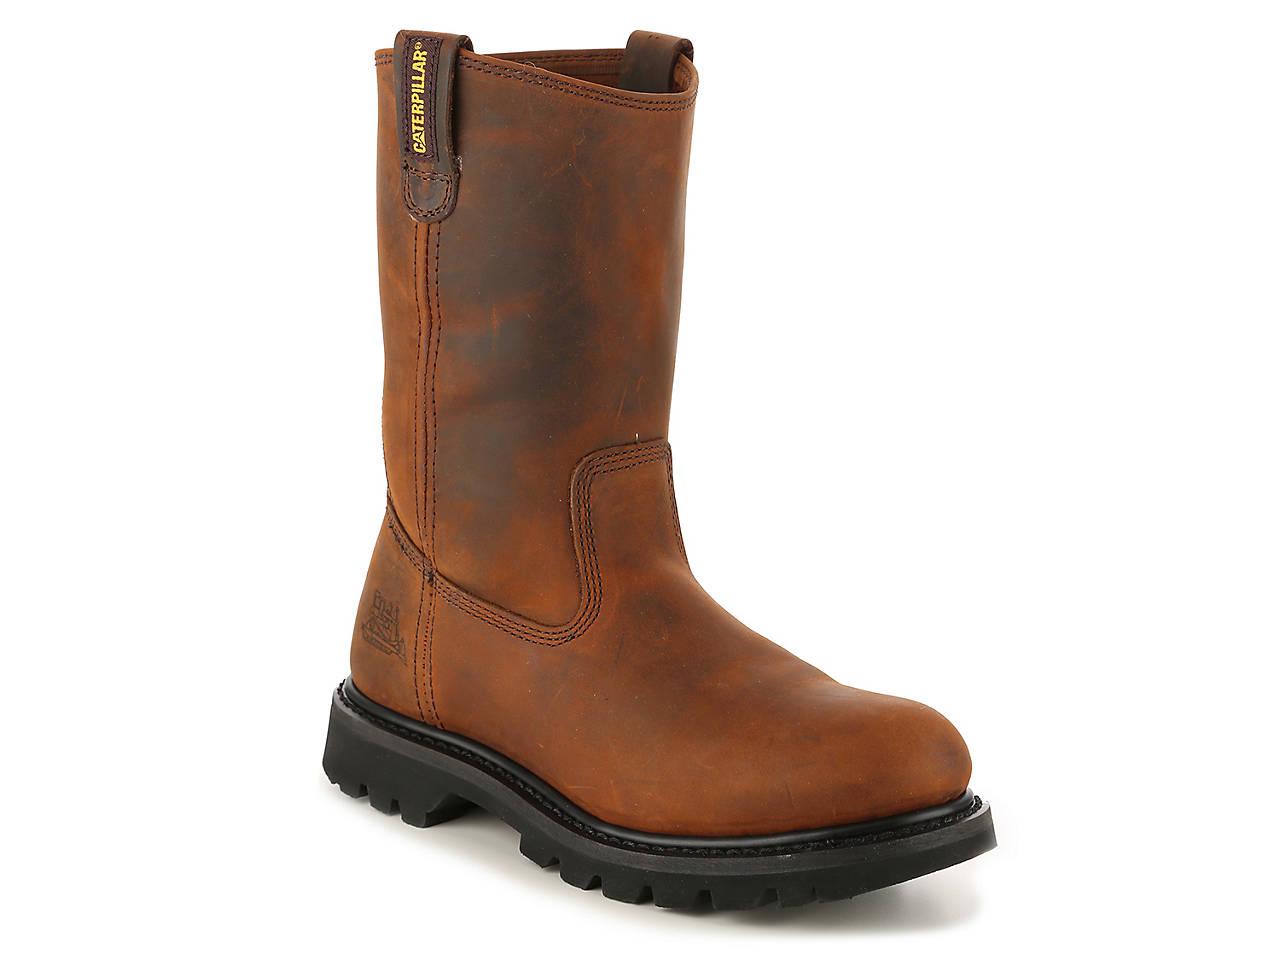 Revolver Steel Toe Work Boot